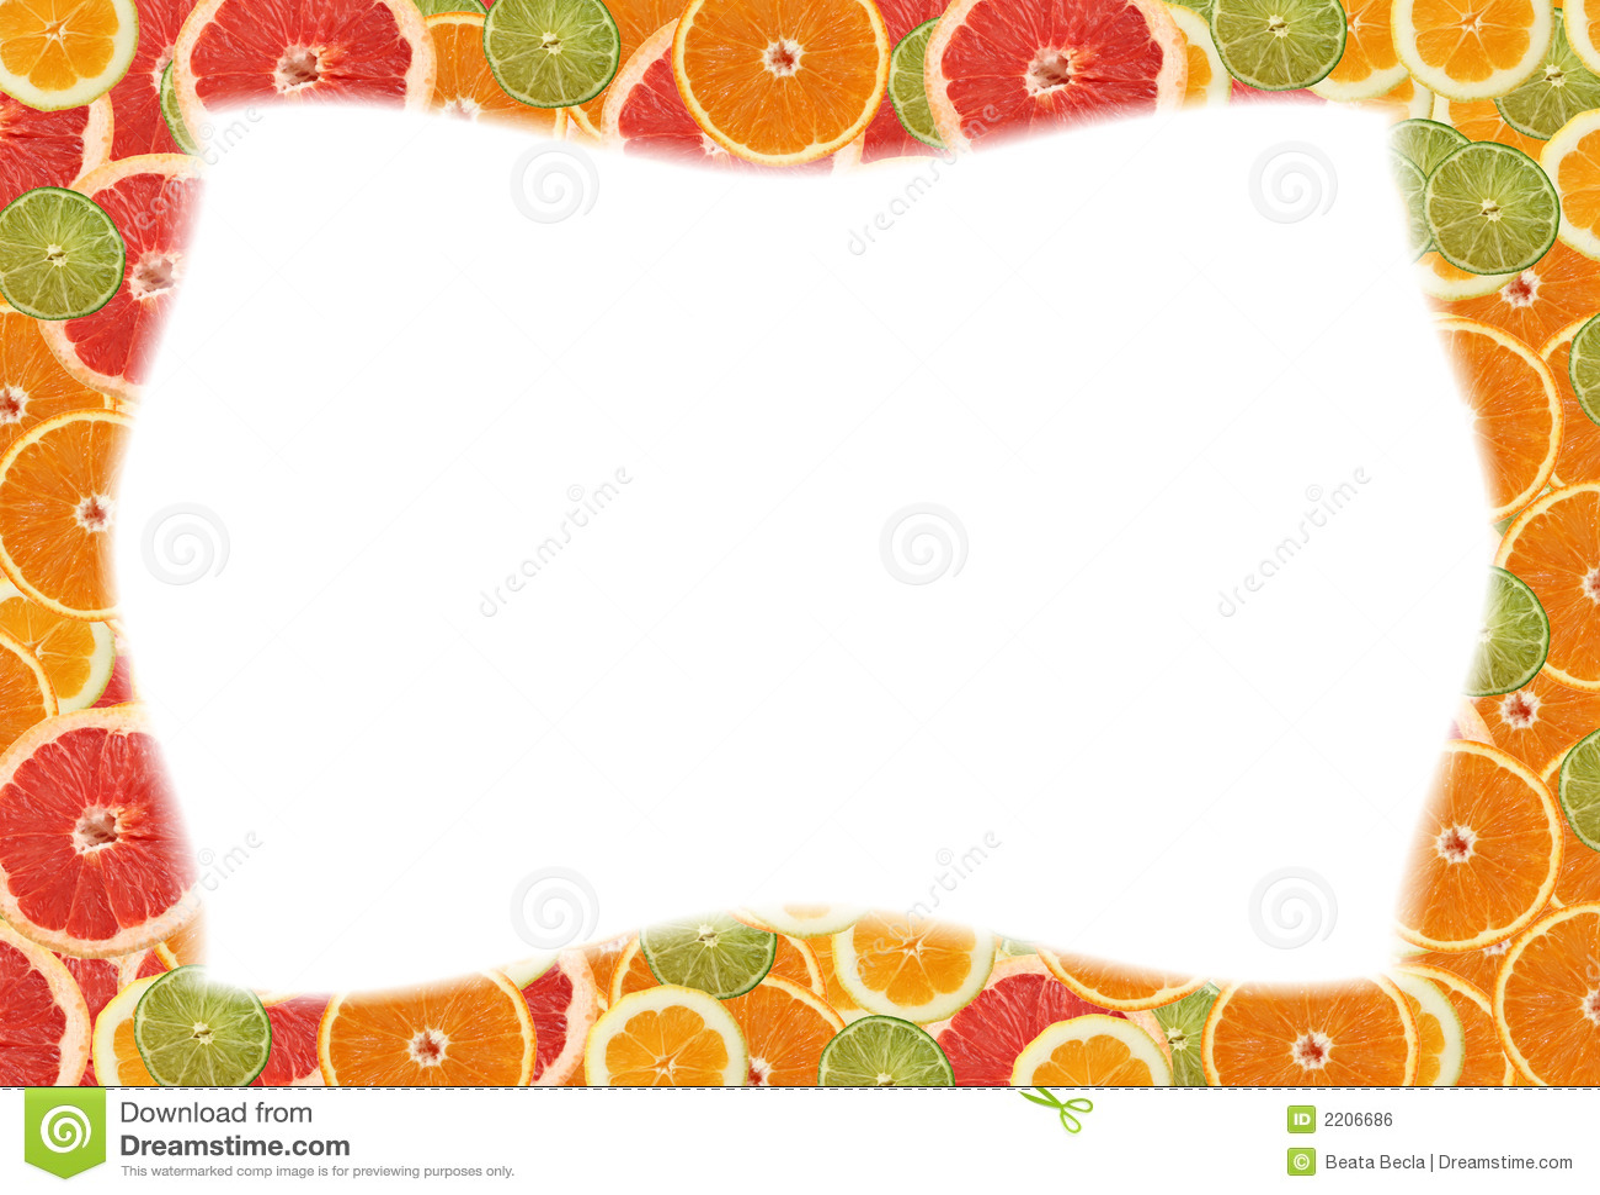 Citrus slice frame